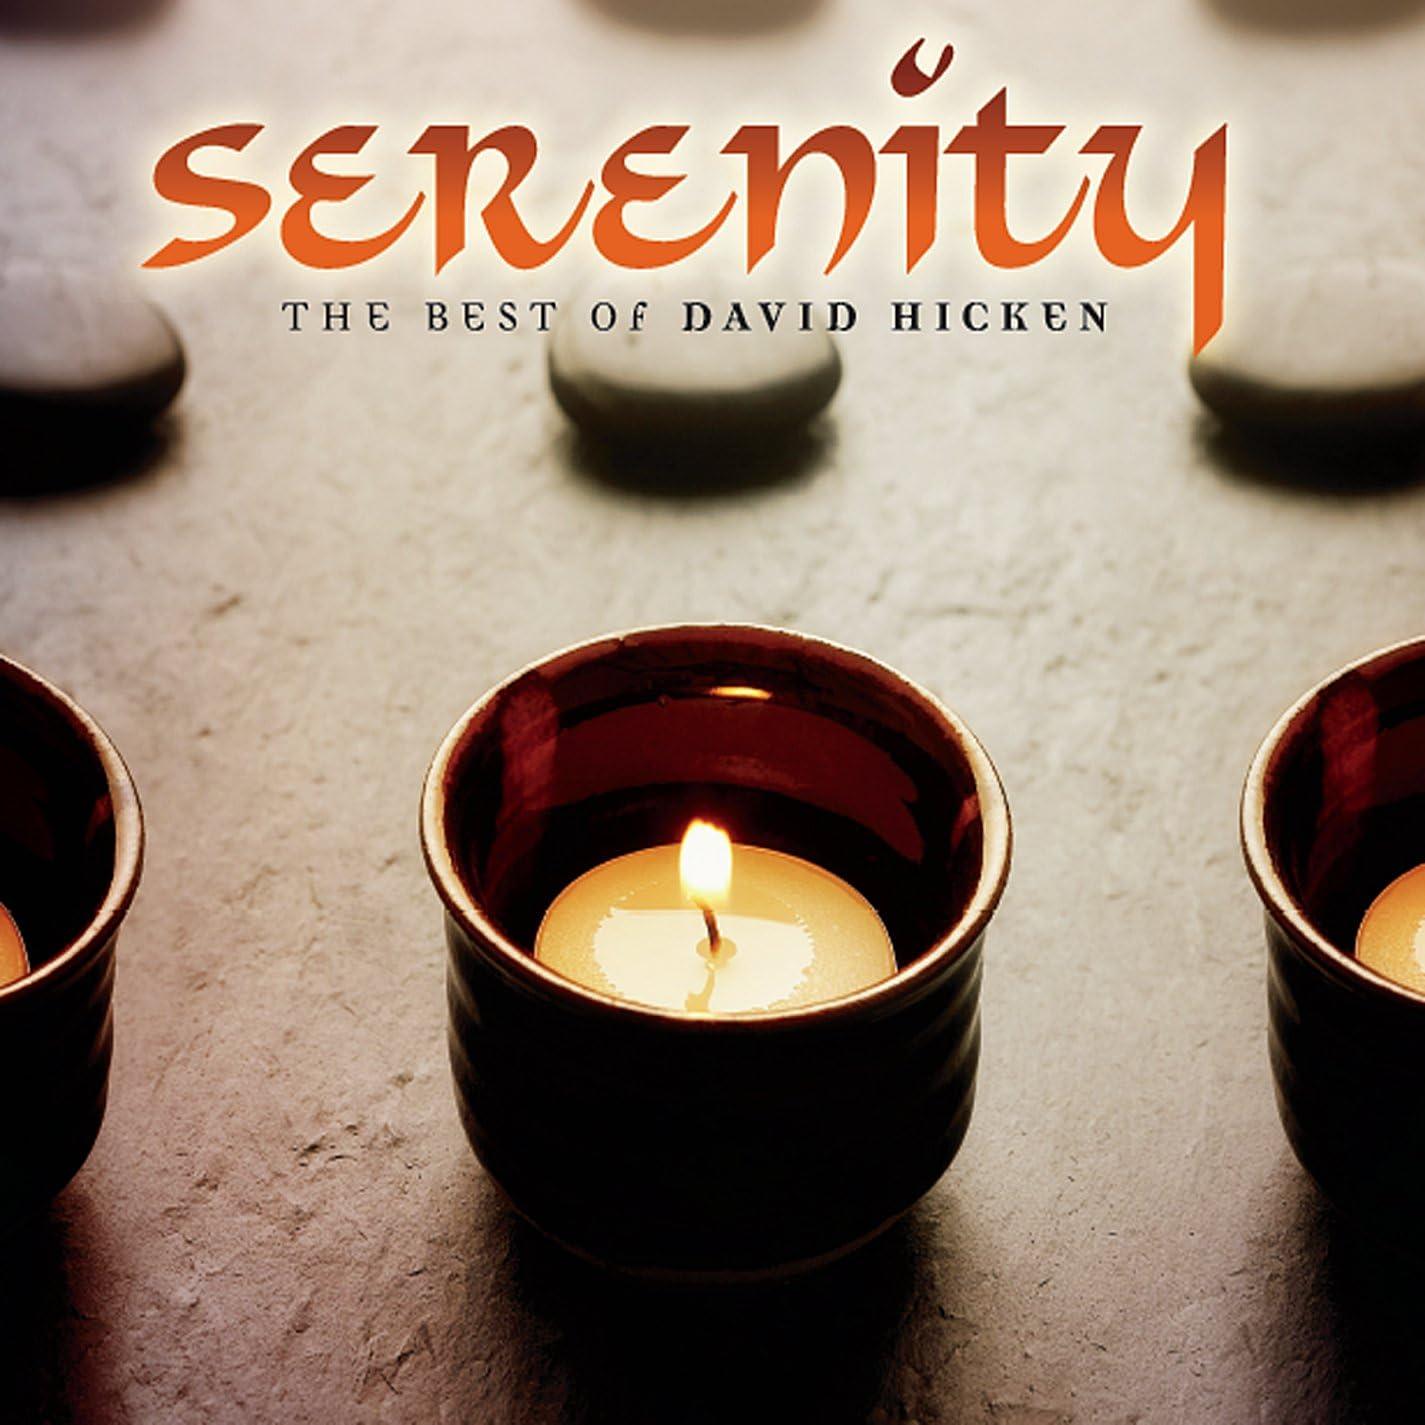 Serenity: The Best of David Hicken